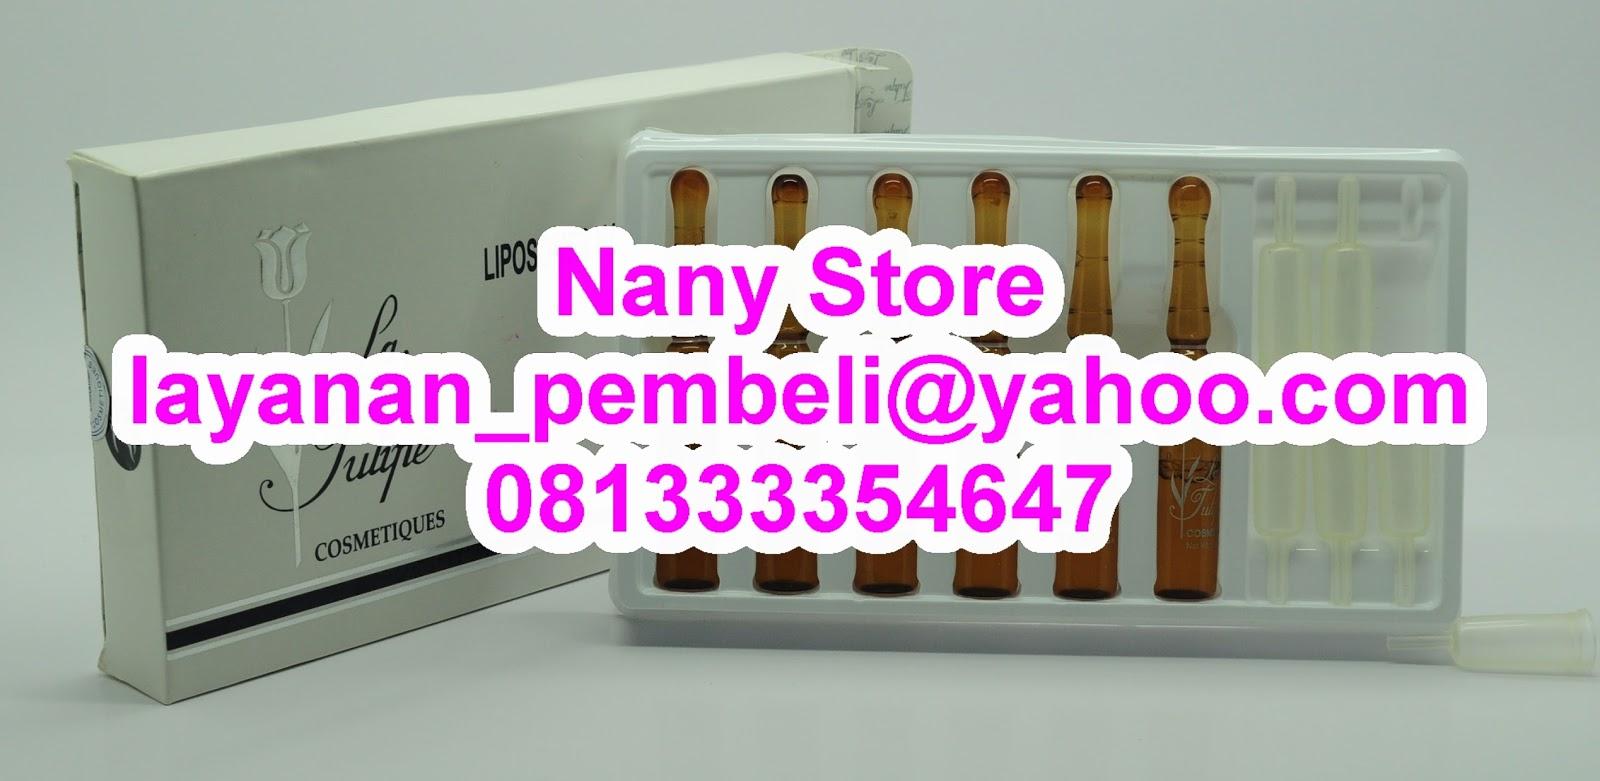 nany store liposomes hair stimulator obat penumbuh rambut